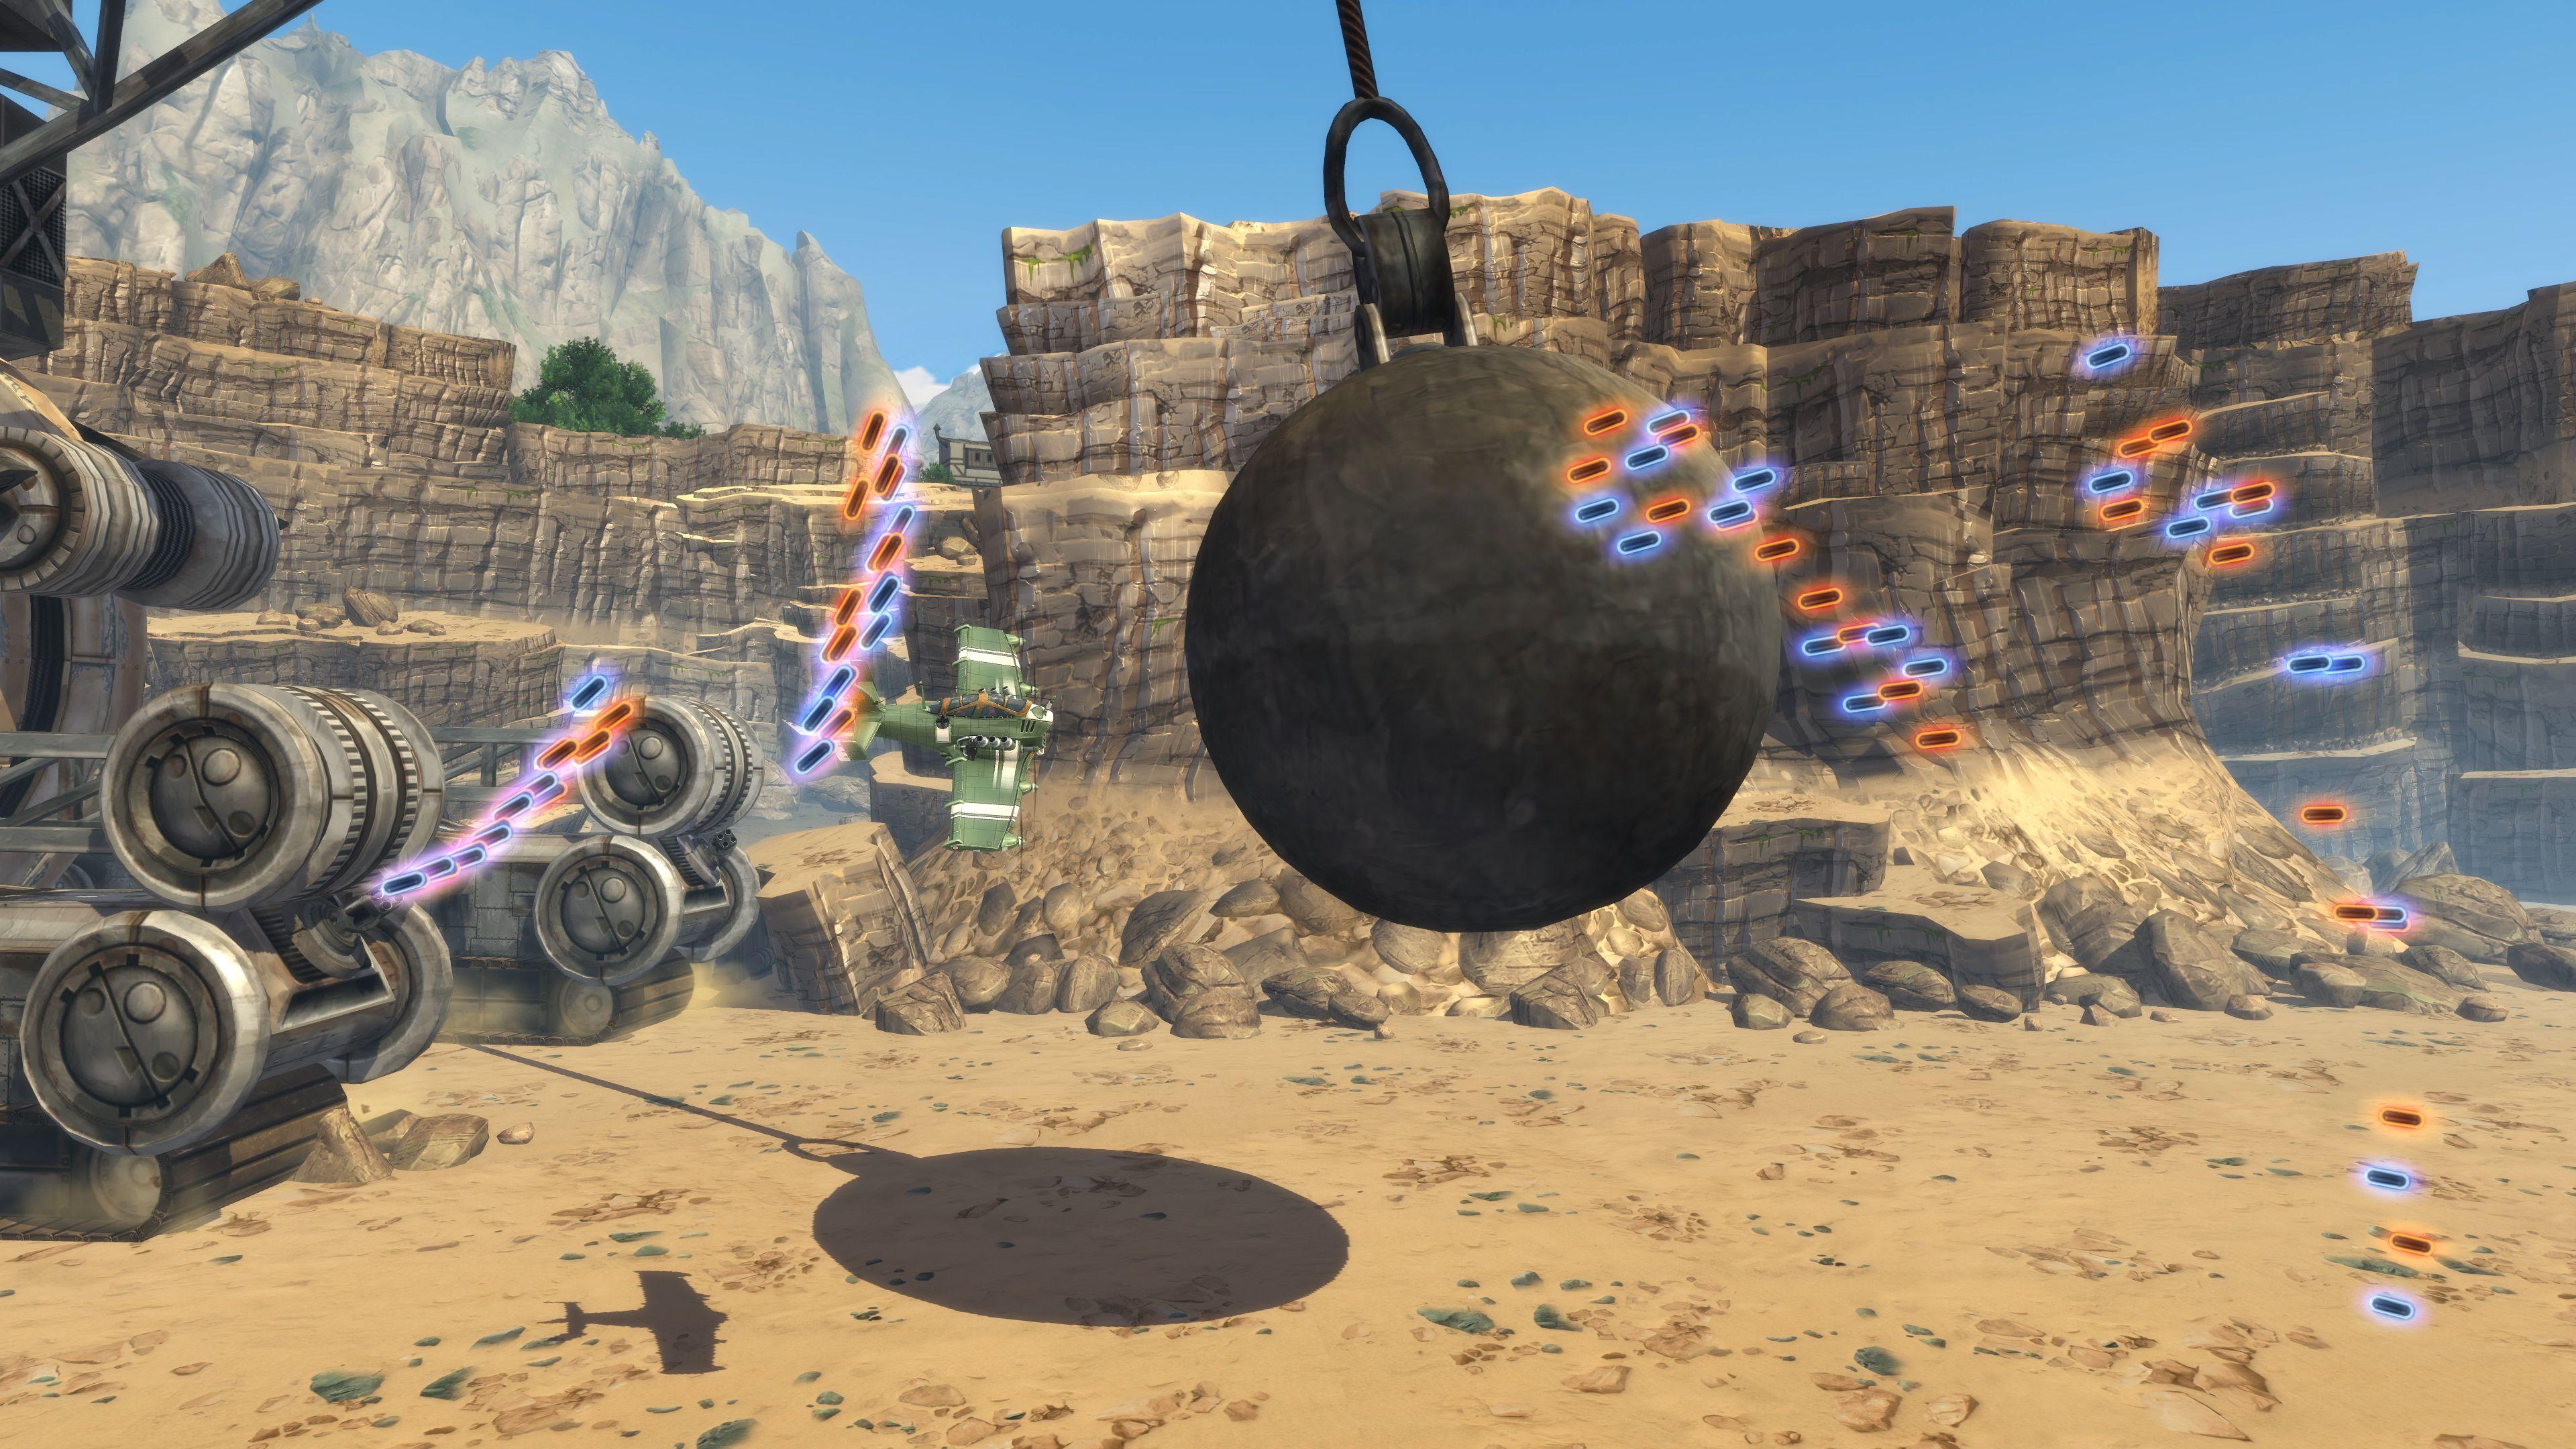 Hry pro Switch se rozrostou o Battle Chasers: Nightwar a Sine Mora EX 142169